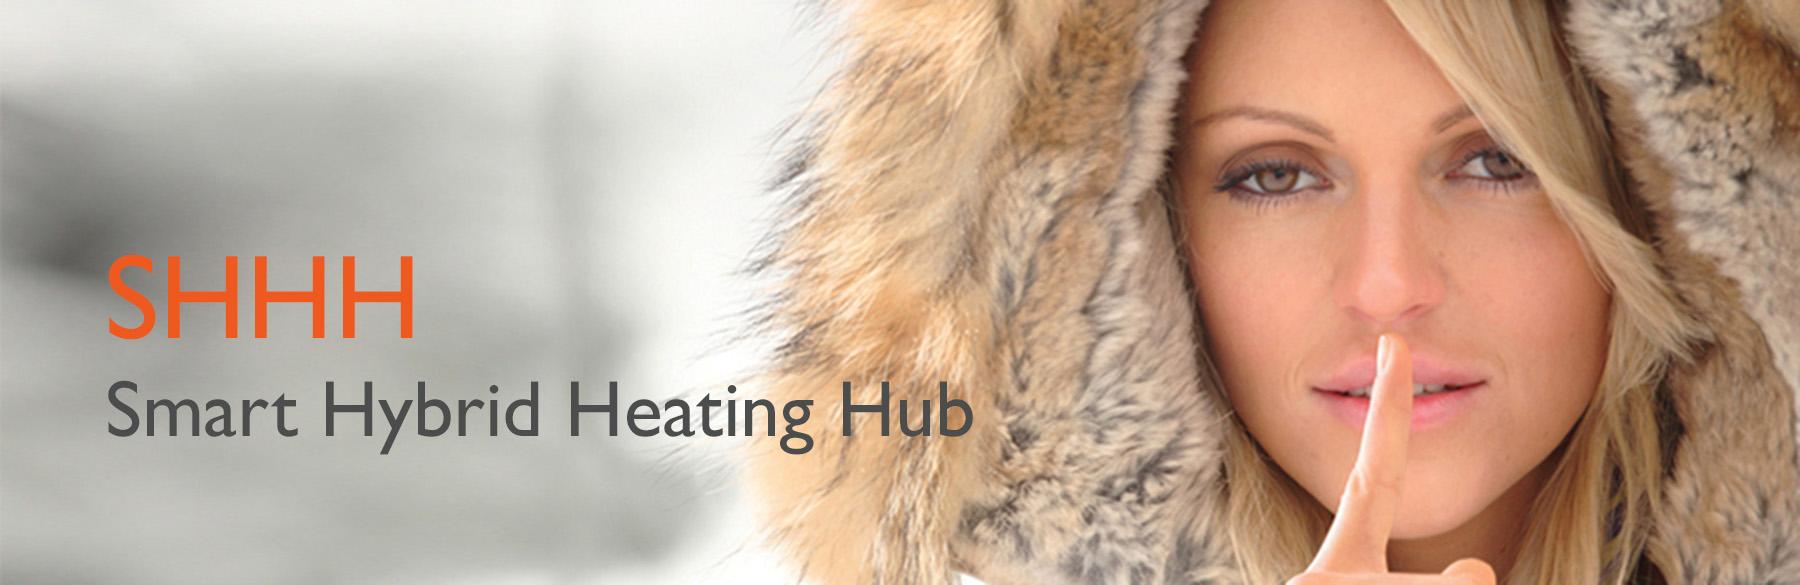 Smart Hybrid Heating Hub